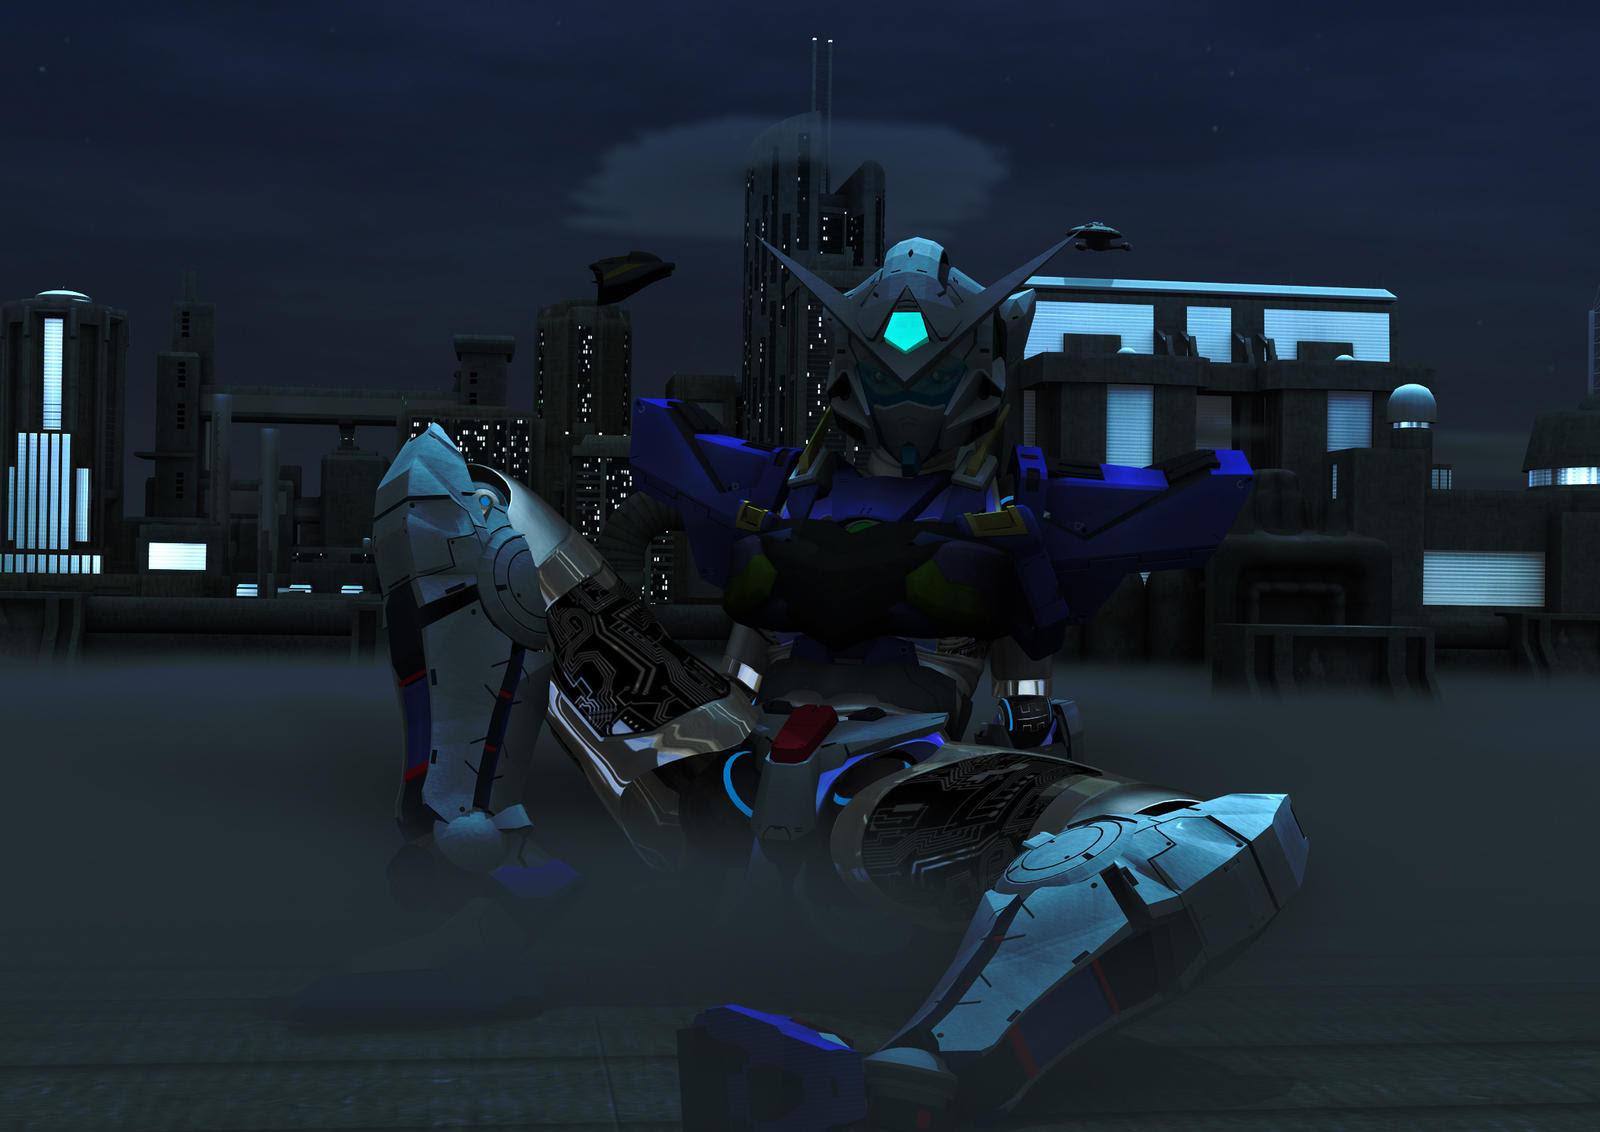 Mechanical Maiden Morpica JasonCanty EvilEliot